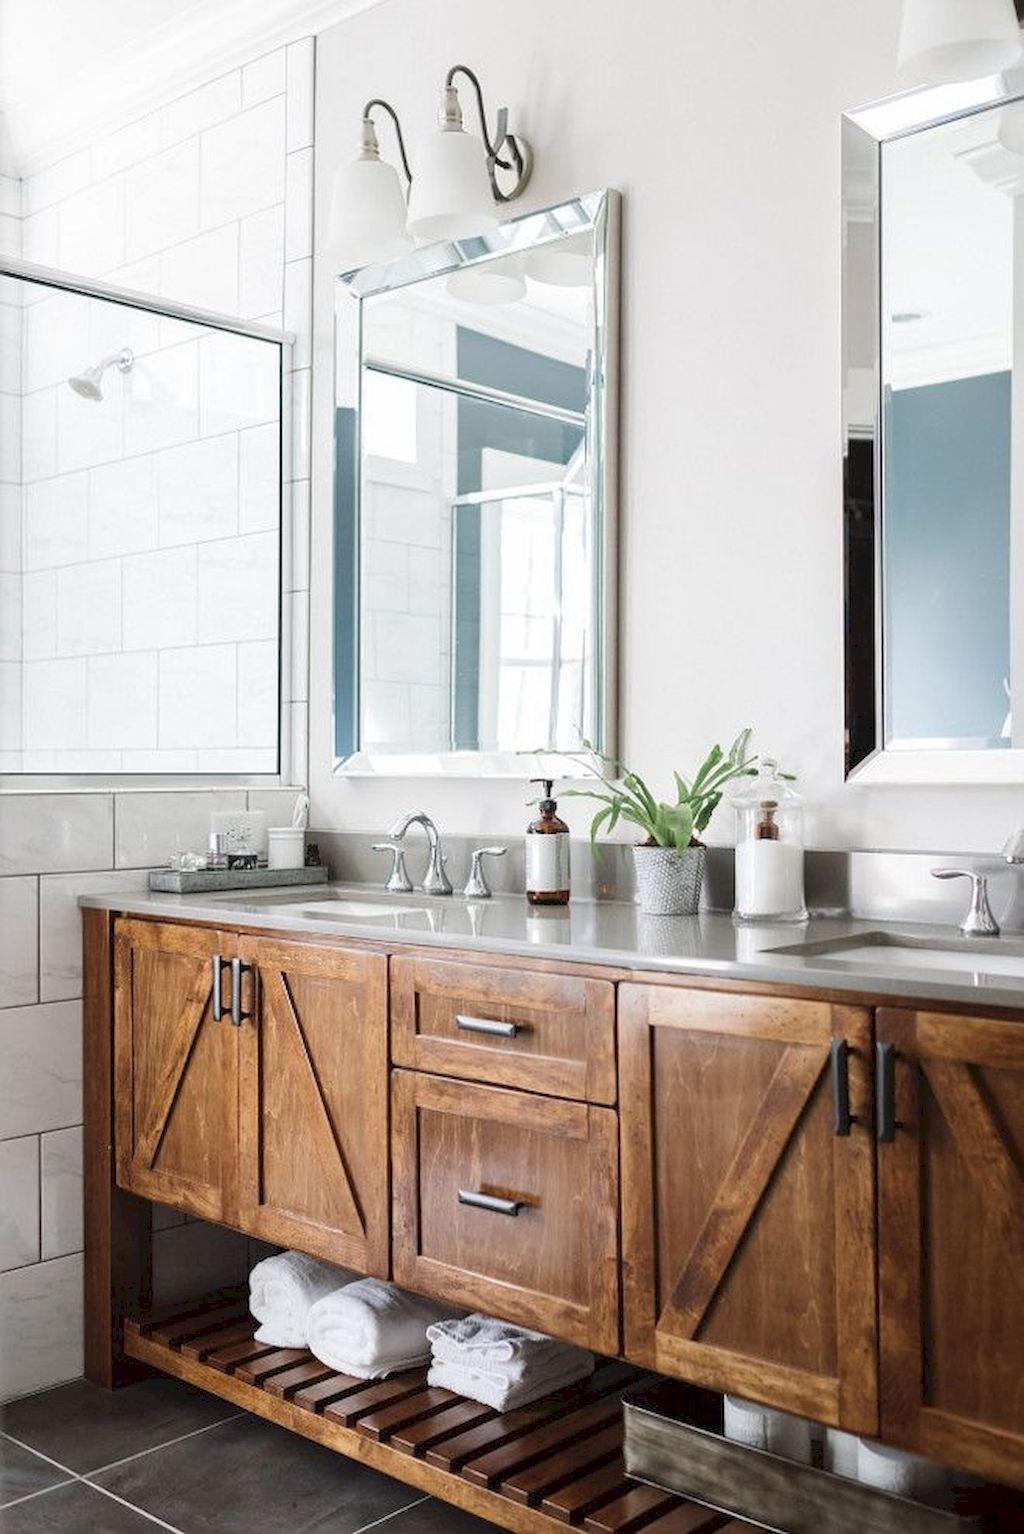 Awesome 60 Vintage Farmhouse Bathroom Remodel Ideas on A